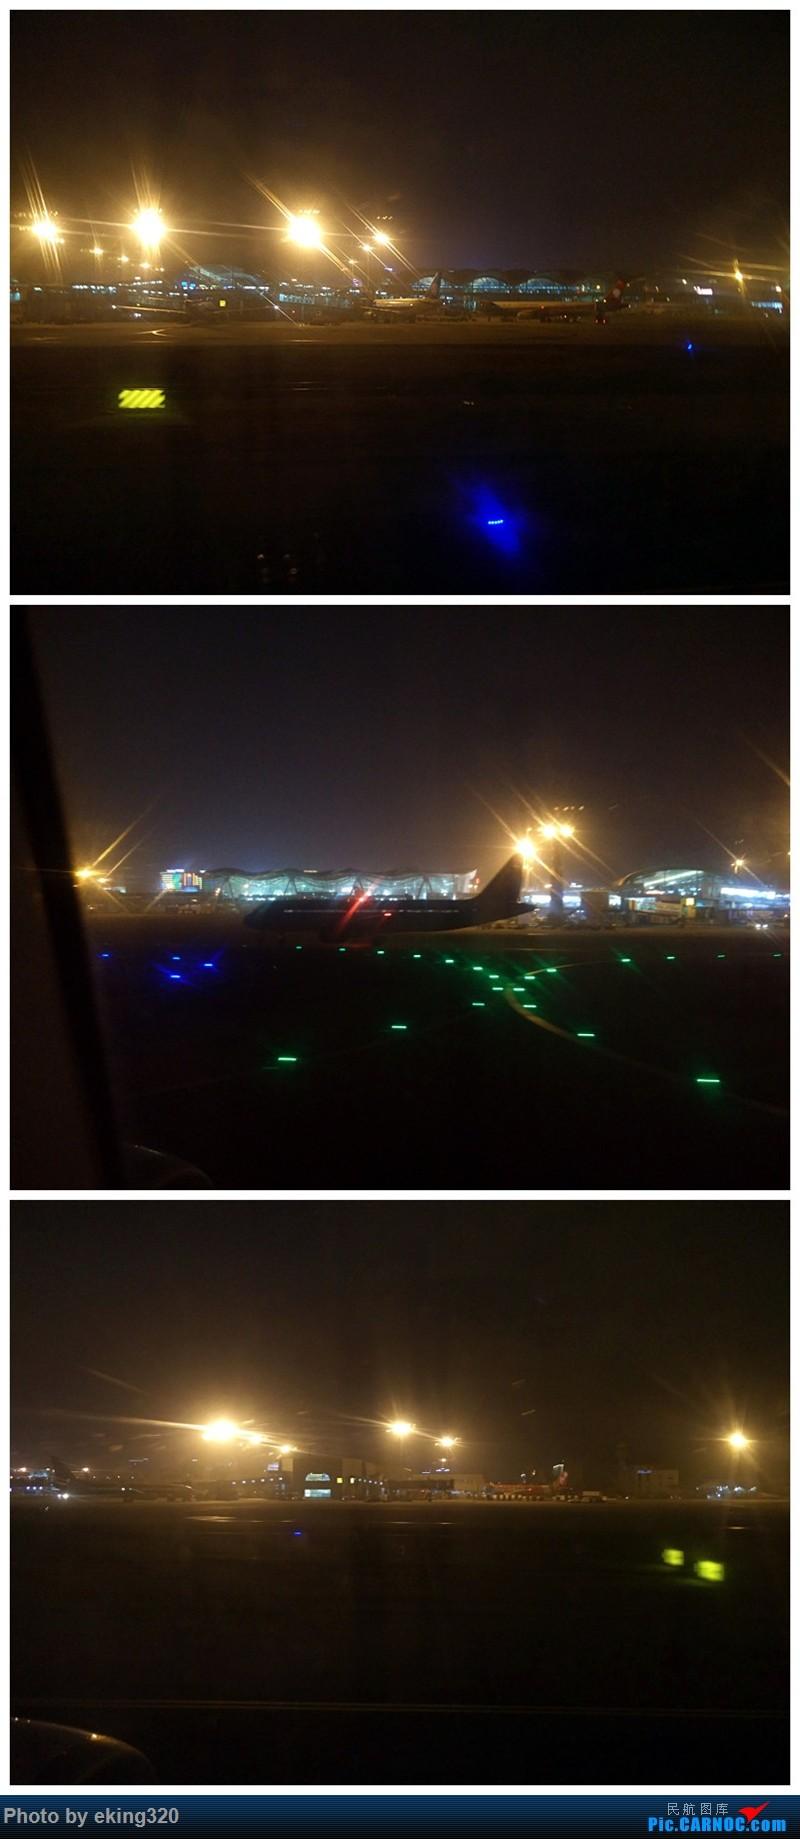 Re:[原创]2016年第三次魔都行(CKG—SHA,PVG—CKG)世界上最大的过山车弯道停车    中国重庆江北国际机场